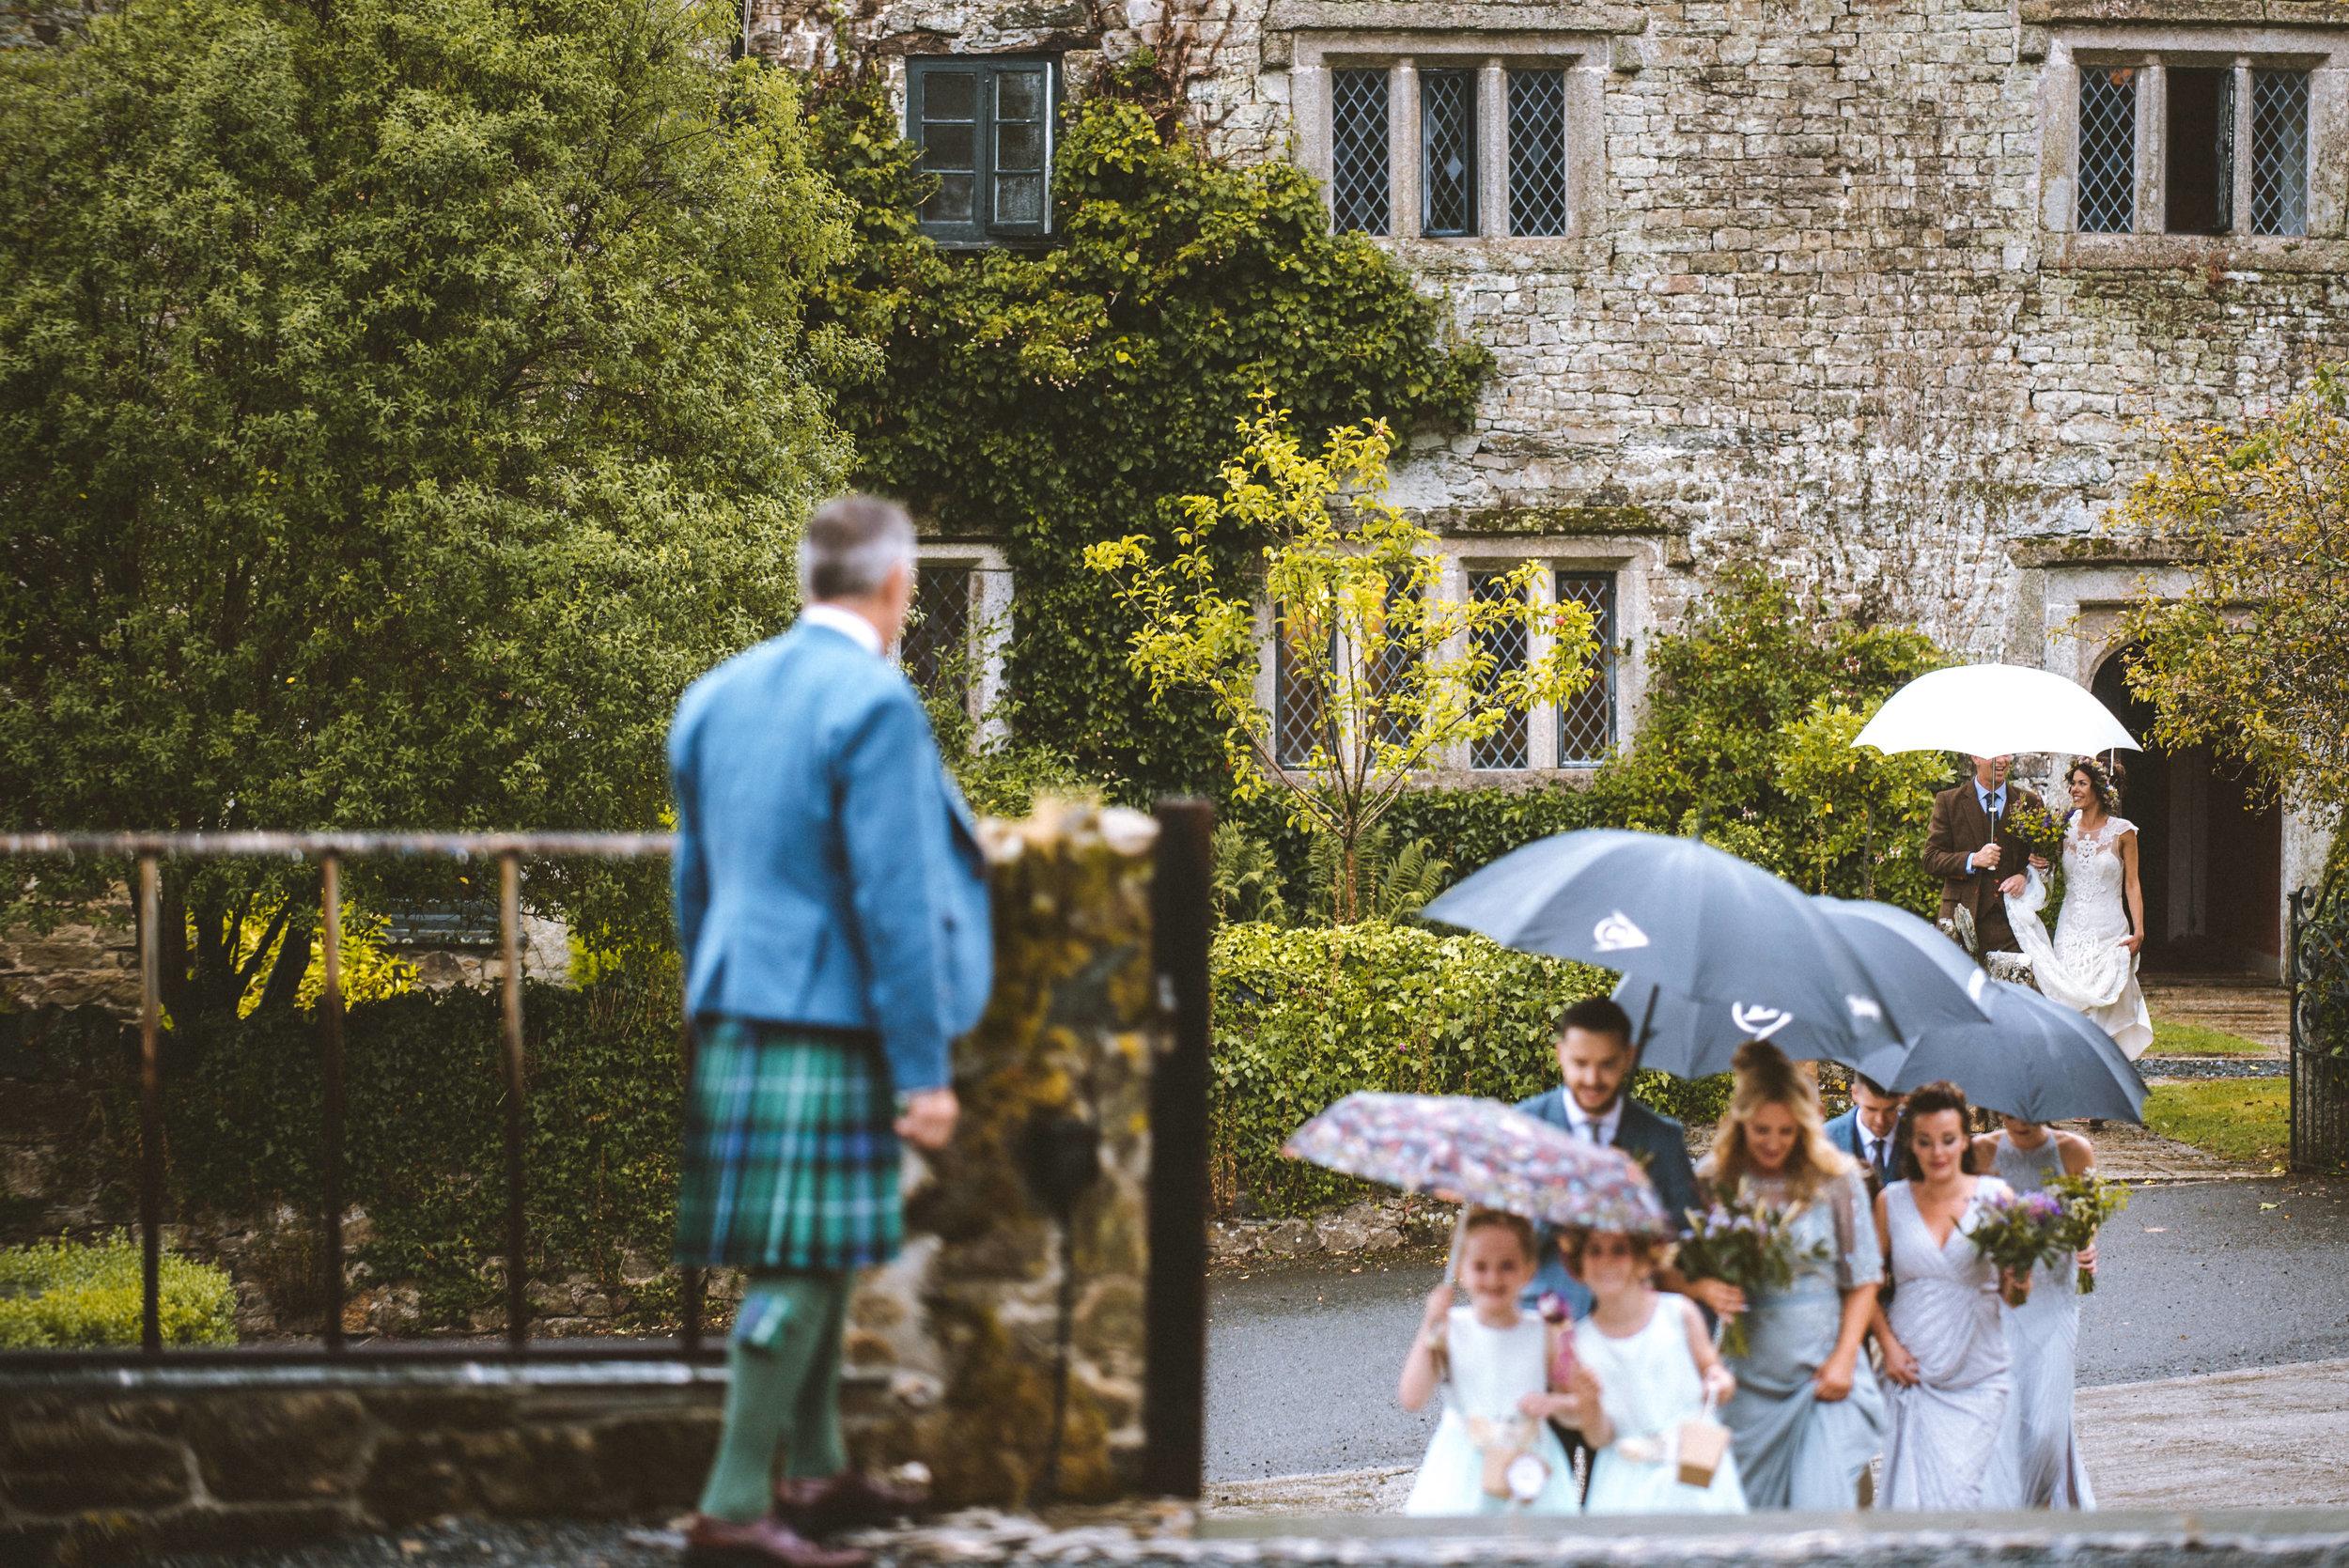 pengenna-manor-wedding-photographer-26.jpg